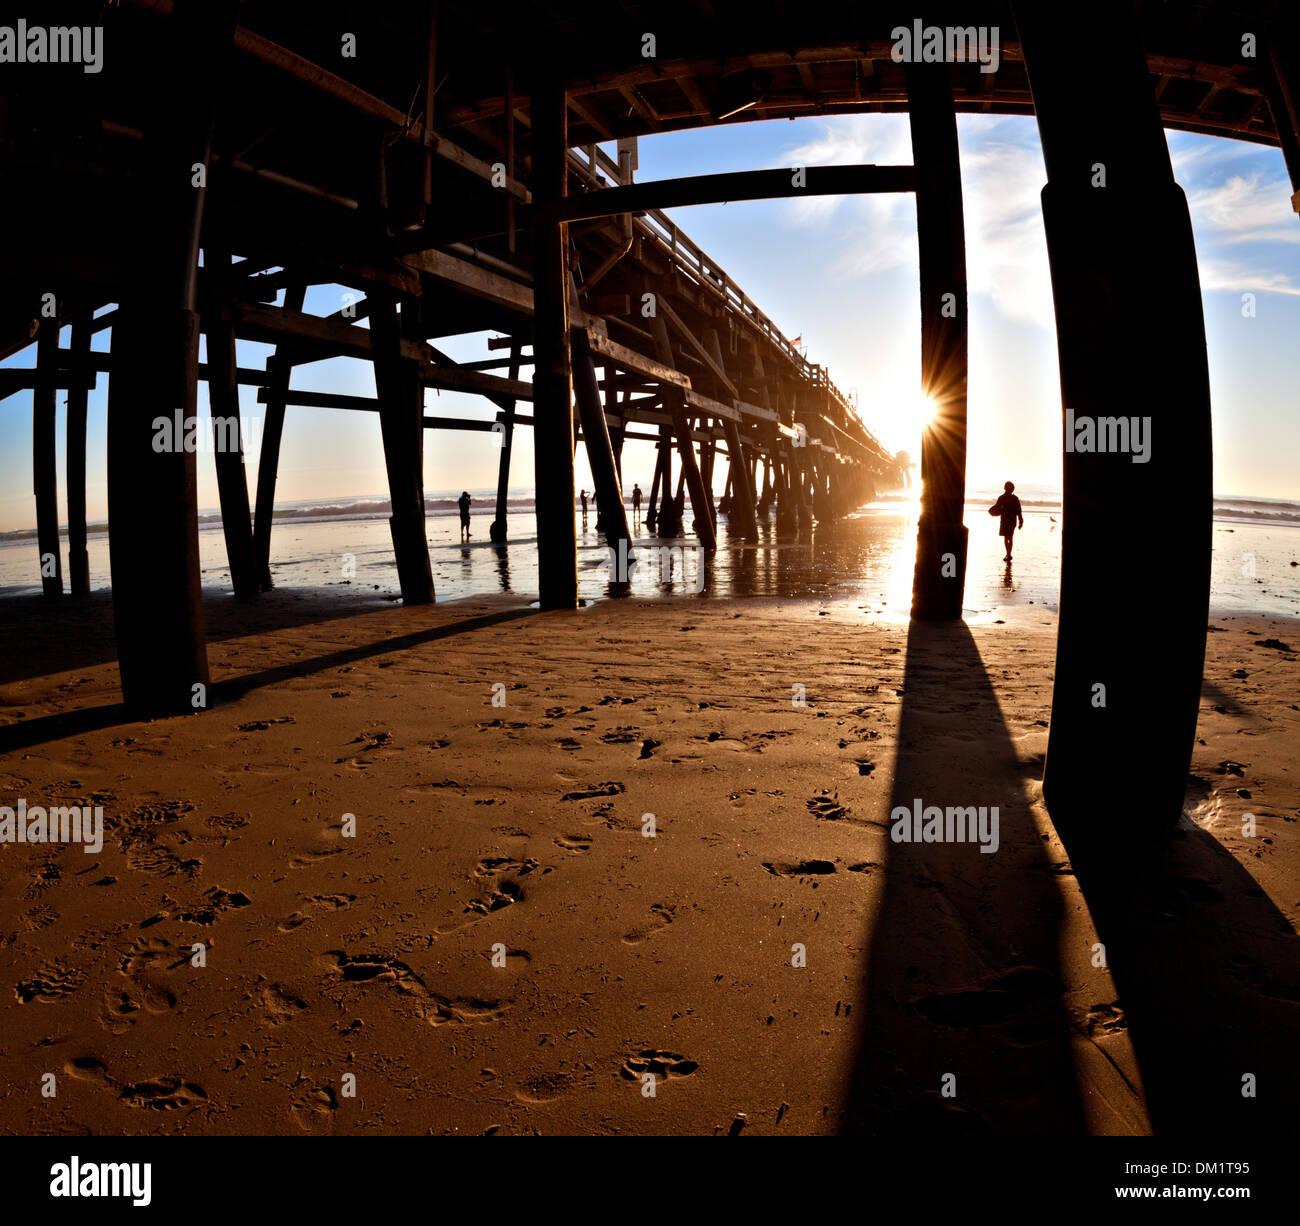 Surfer at sunset, San Clemente Pier, California. Stock Photo